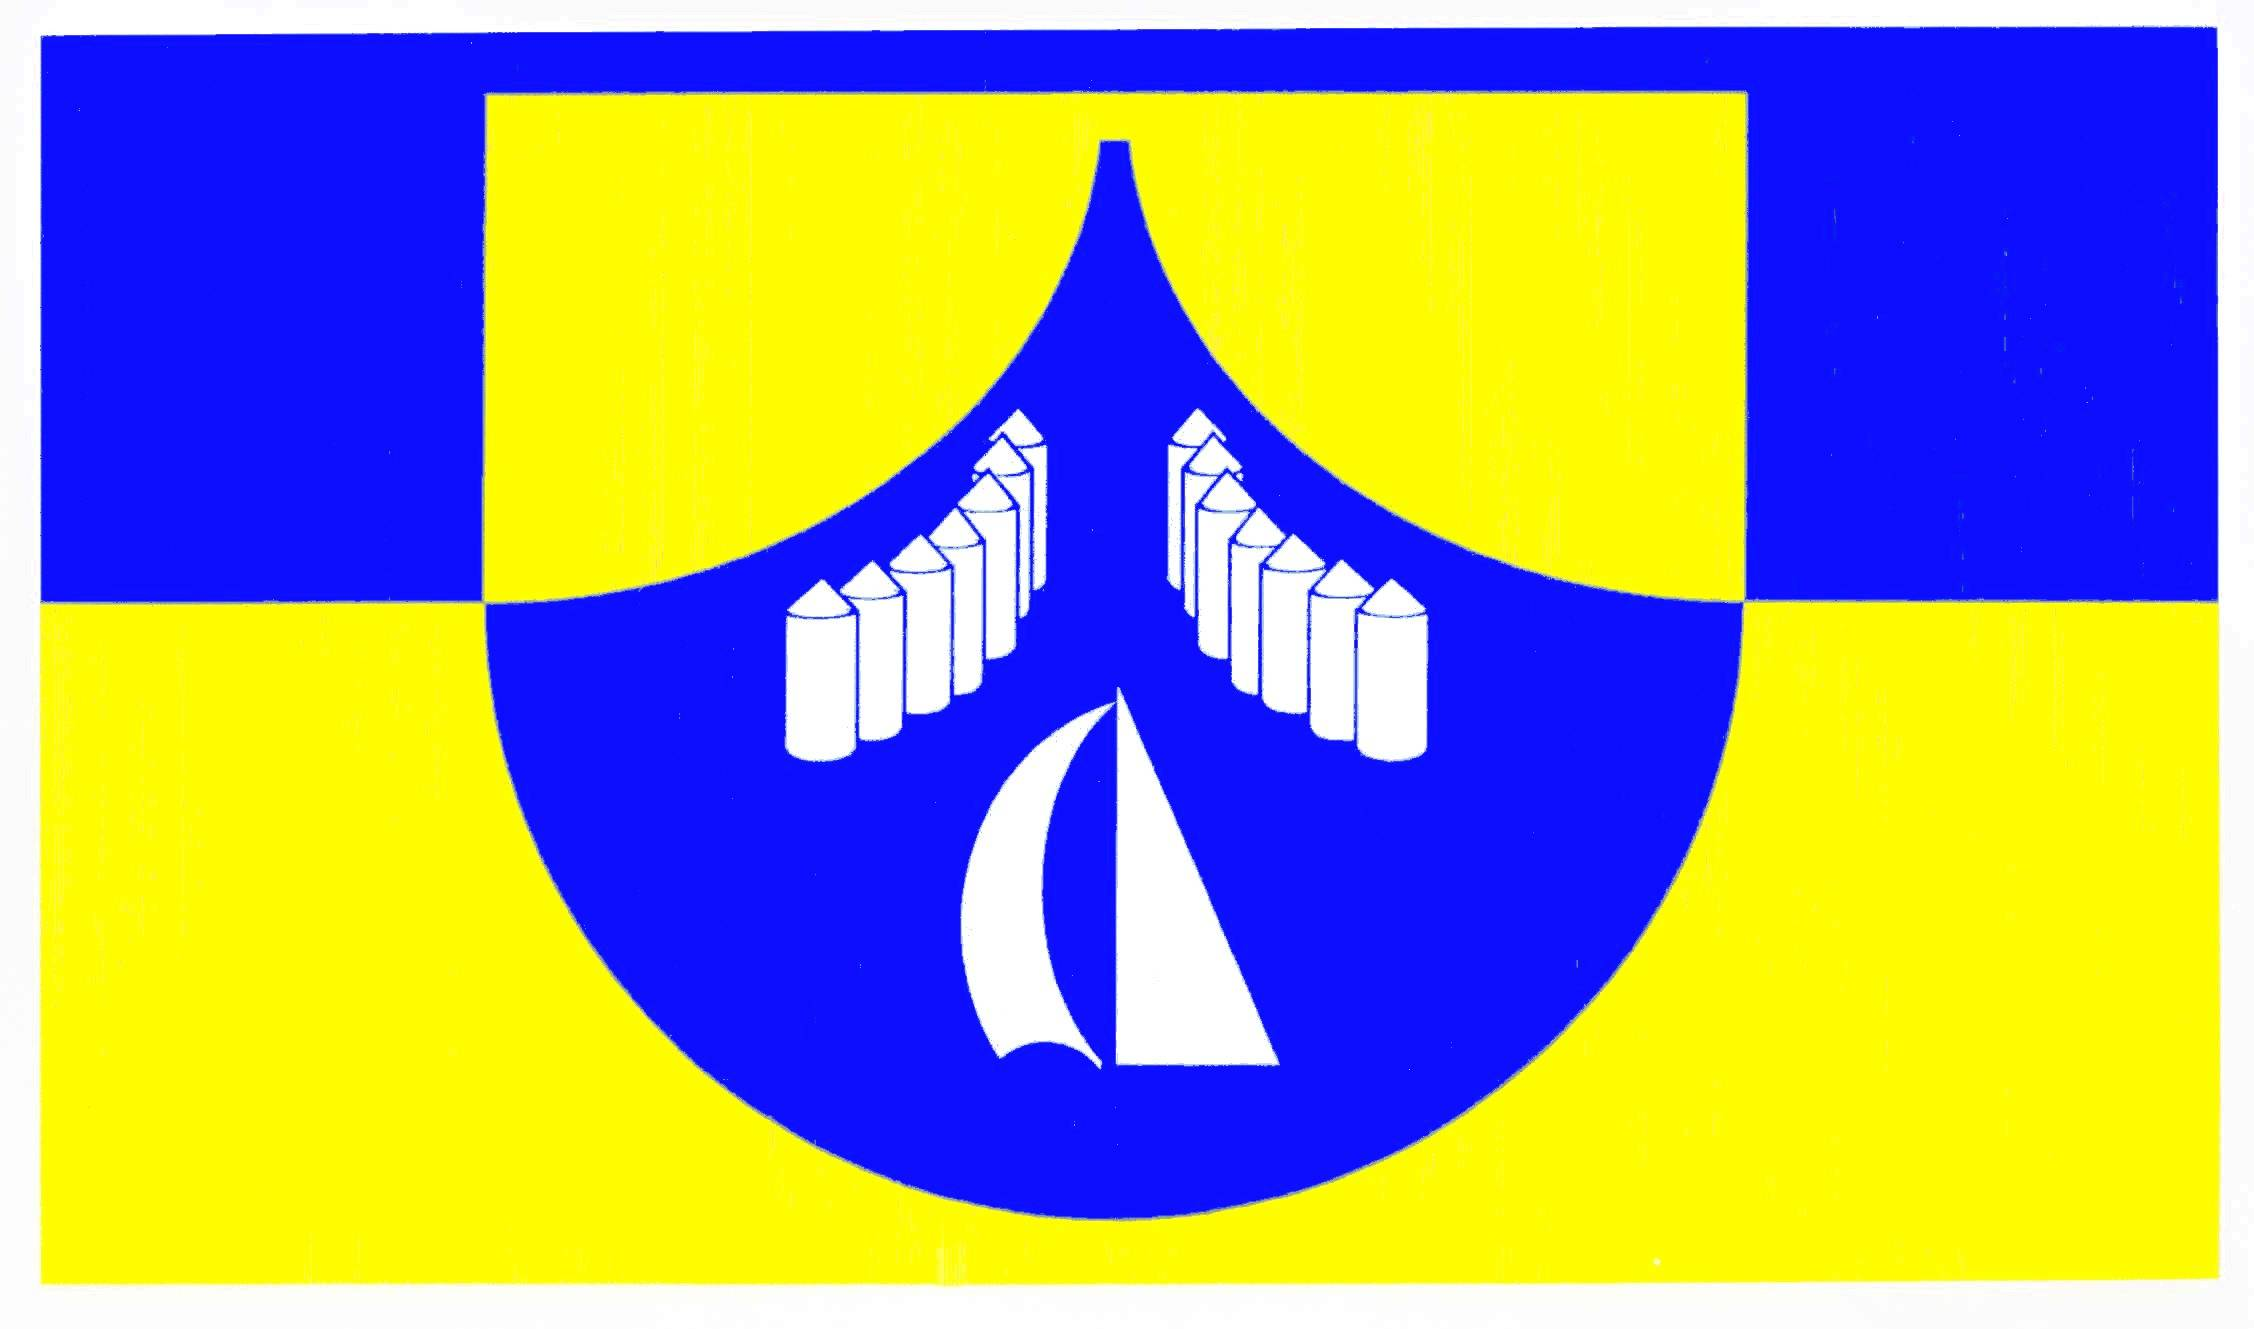 Flagge GemeindeBorgwedel, Kreis Schleswig-Flensburg